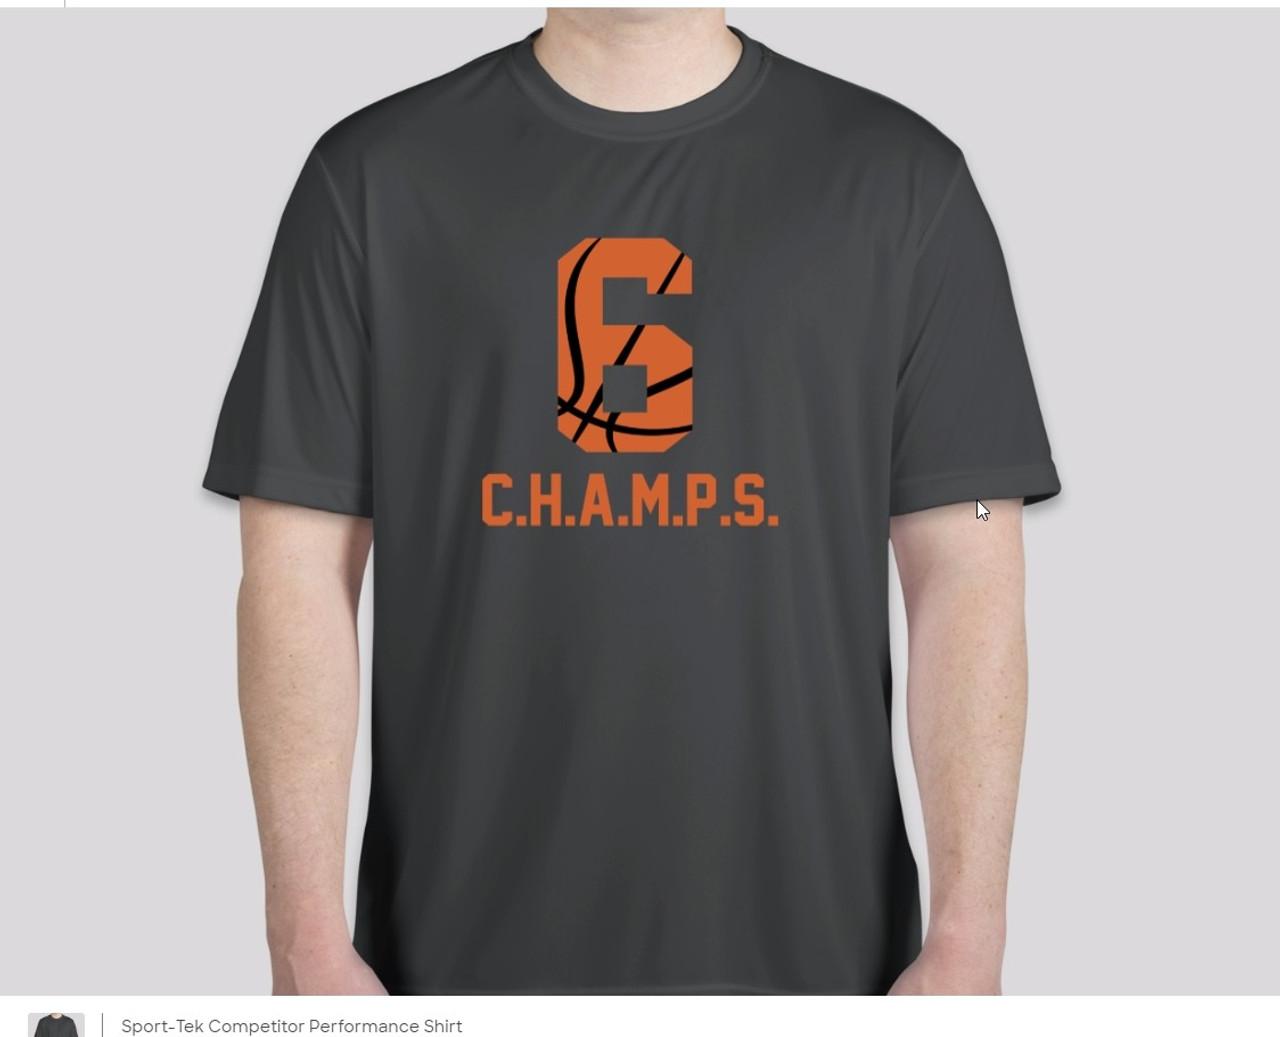 Performance CHAMPS Baskeball Team Shirt Big Ball 6